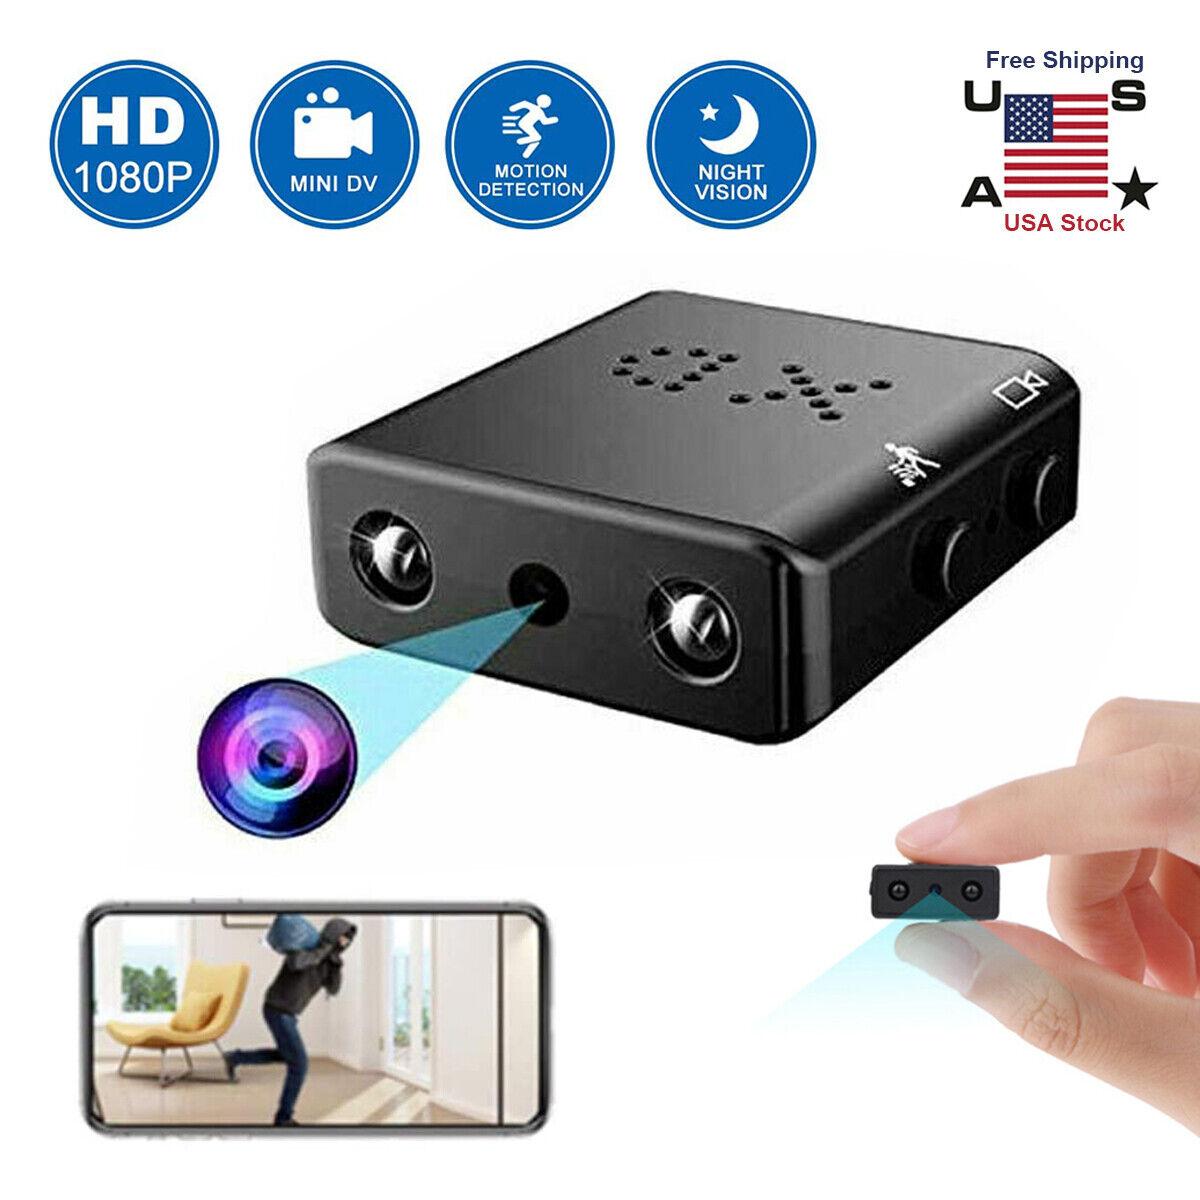 1080P HD Pen DVR Cam Hidden Spy Video Camera Recorder Wireless Camcorder New